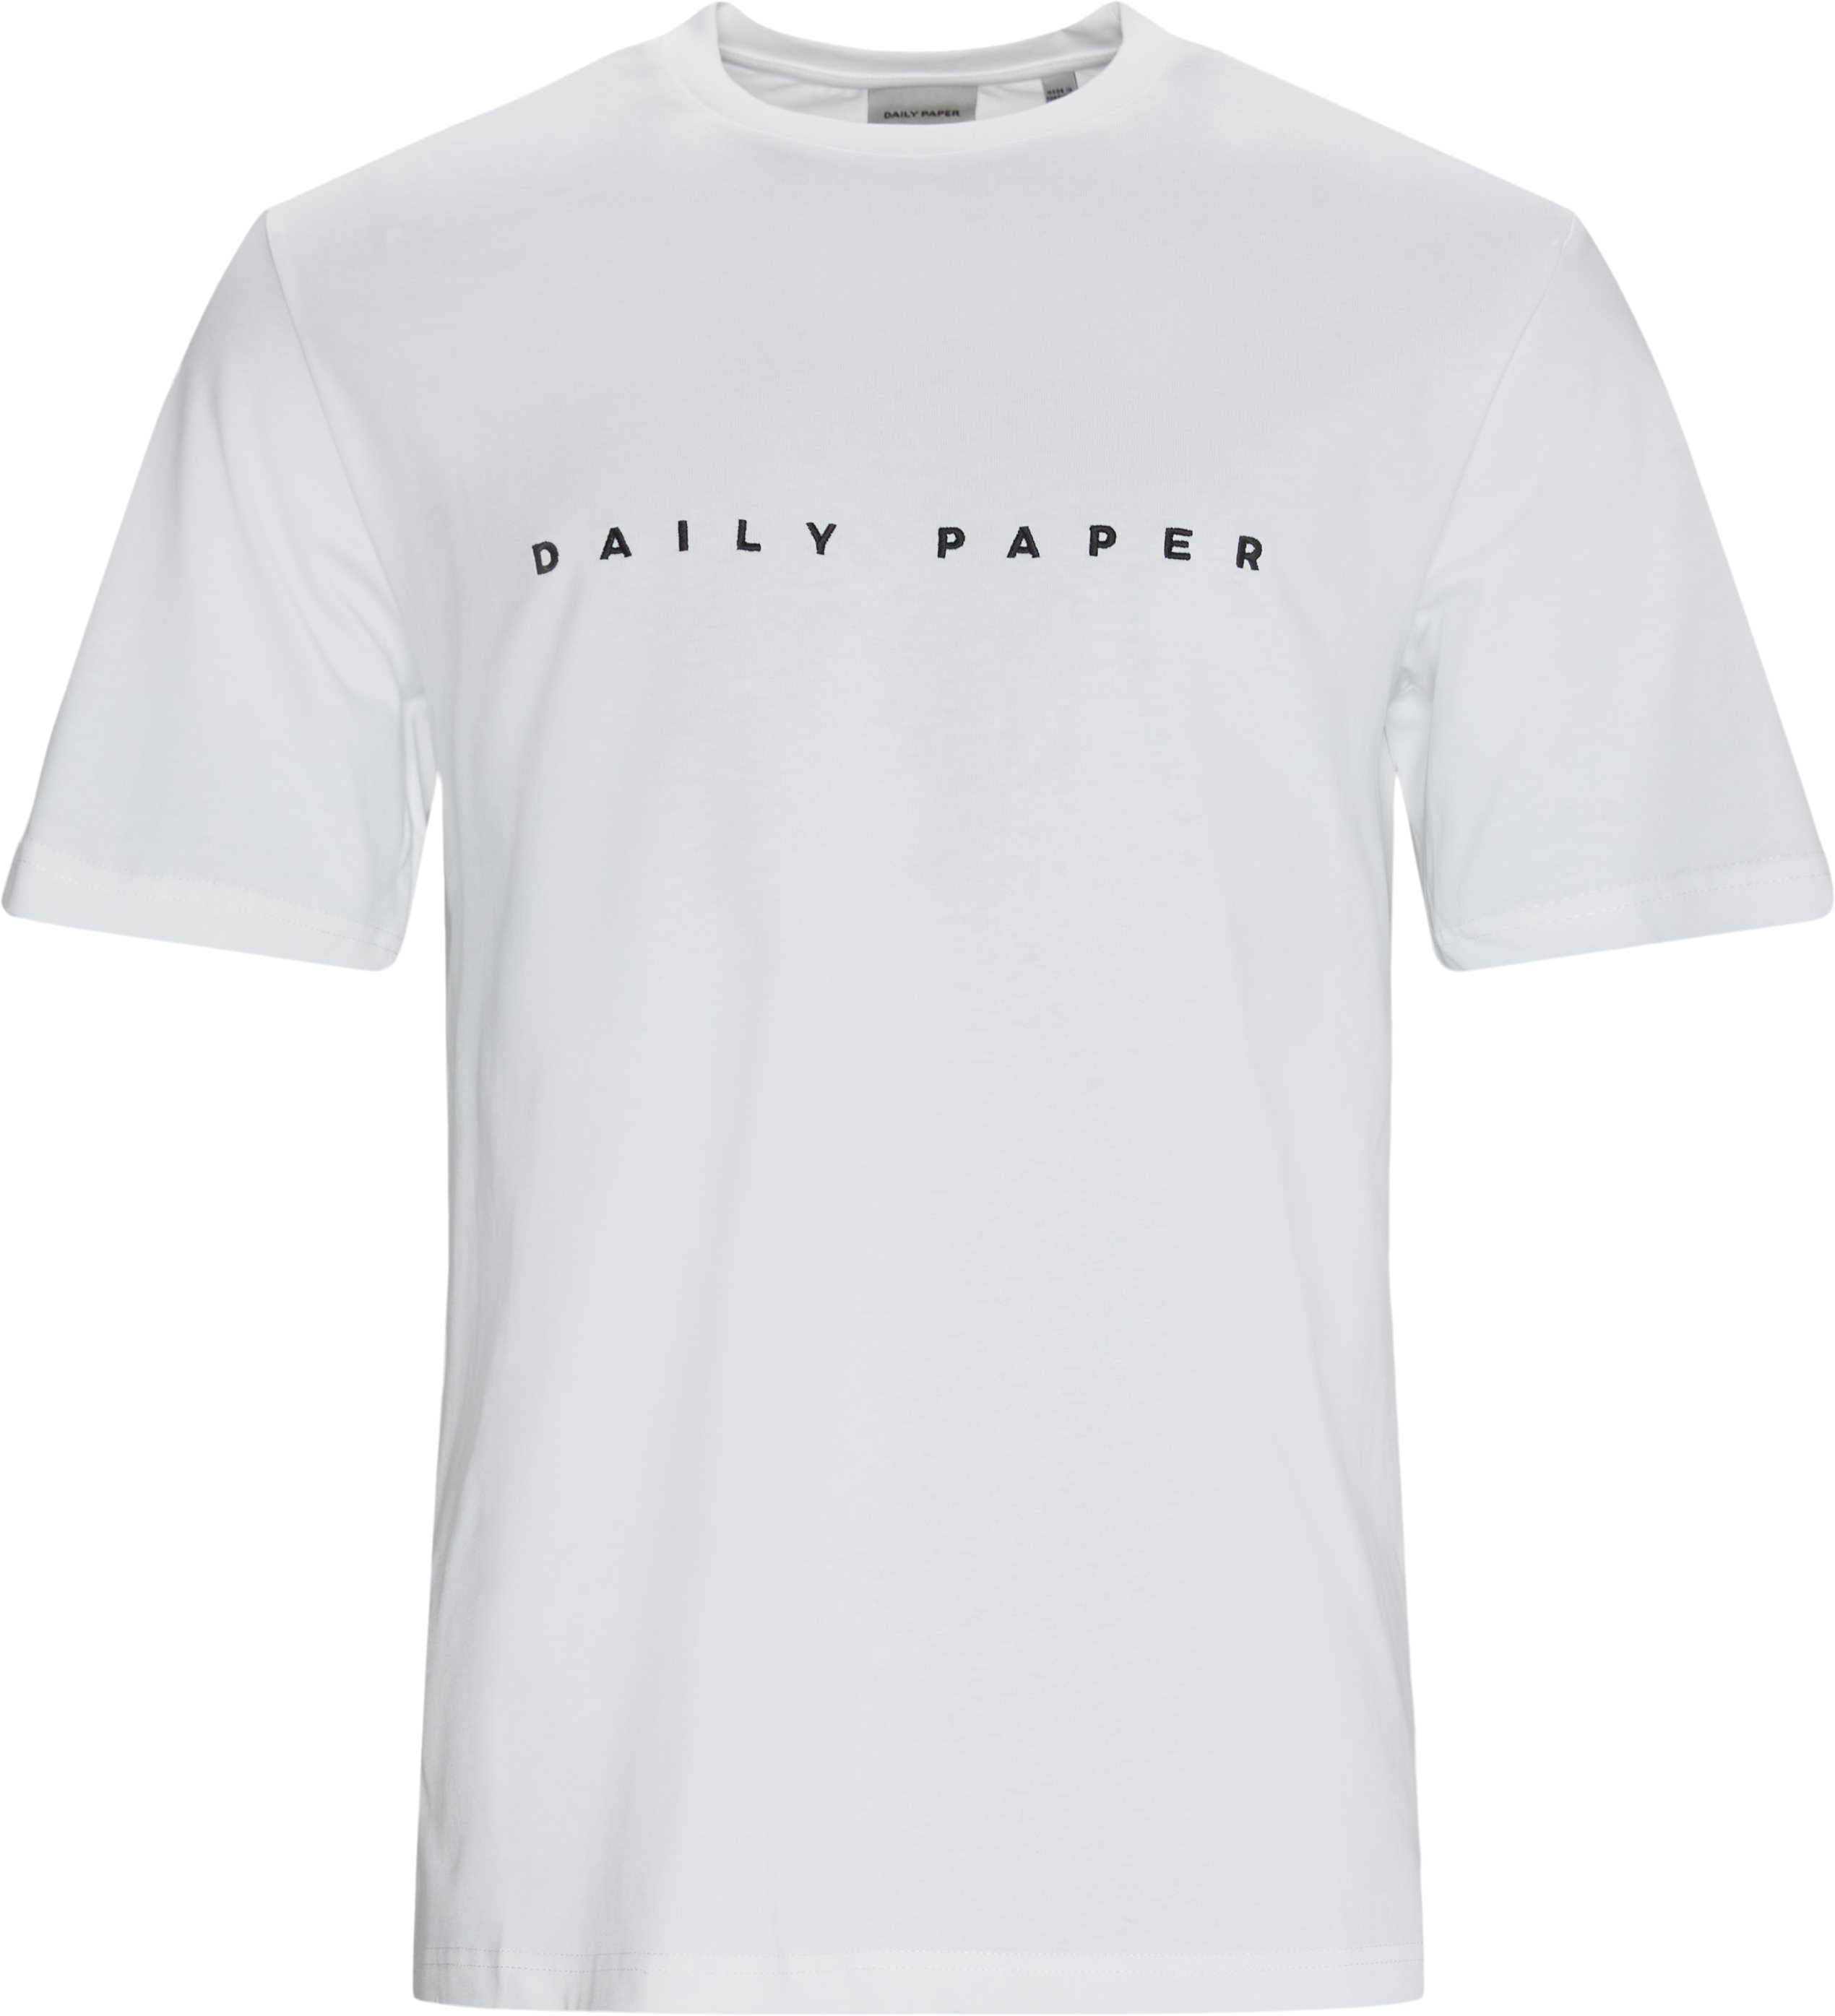 Alias Tee - T-shirts - Regular - Vit